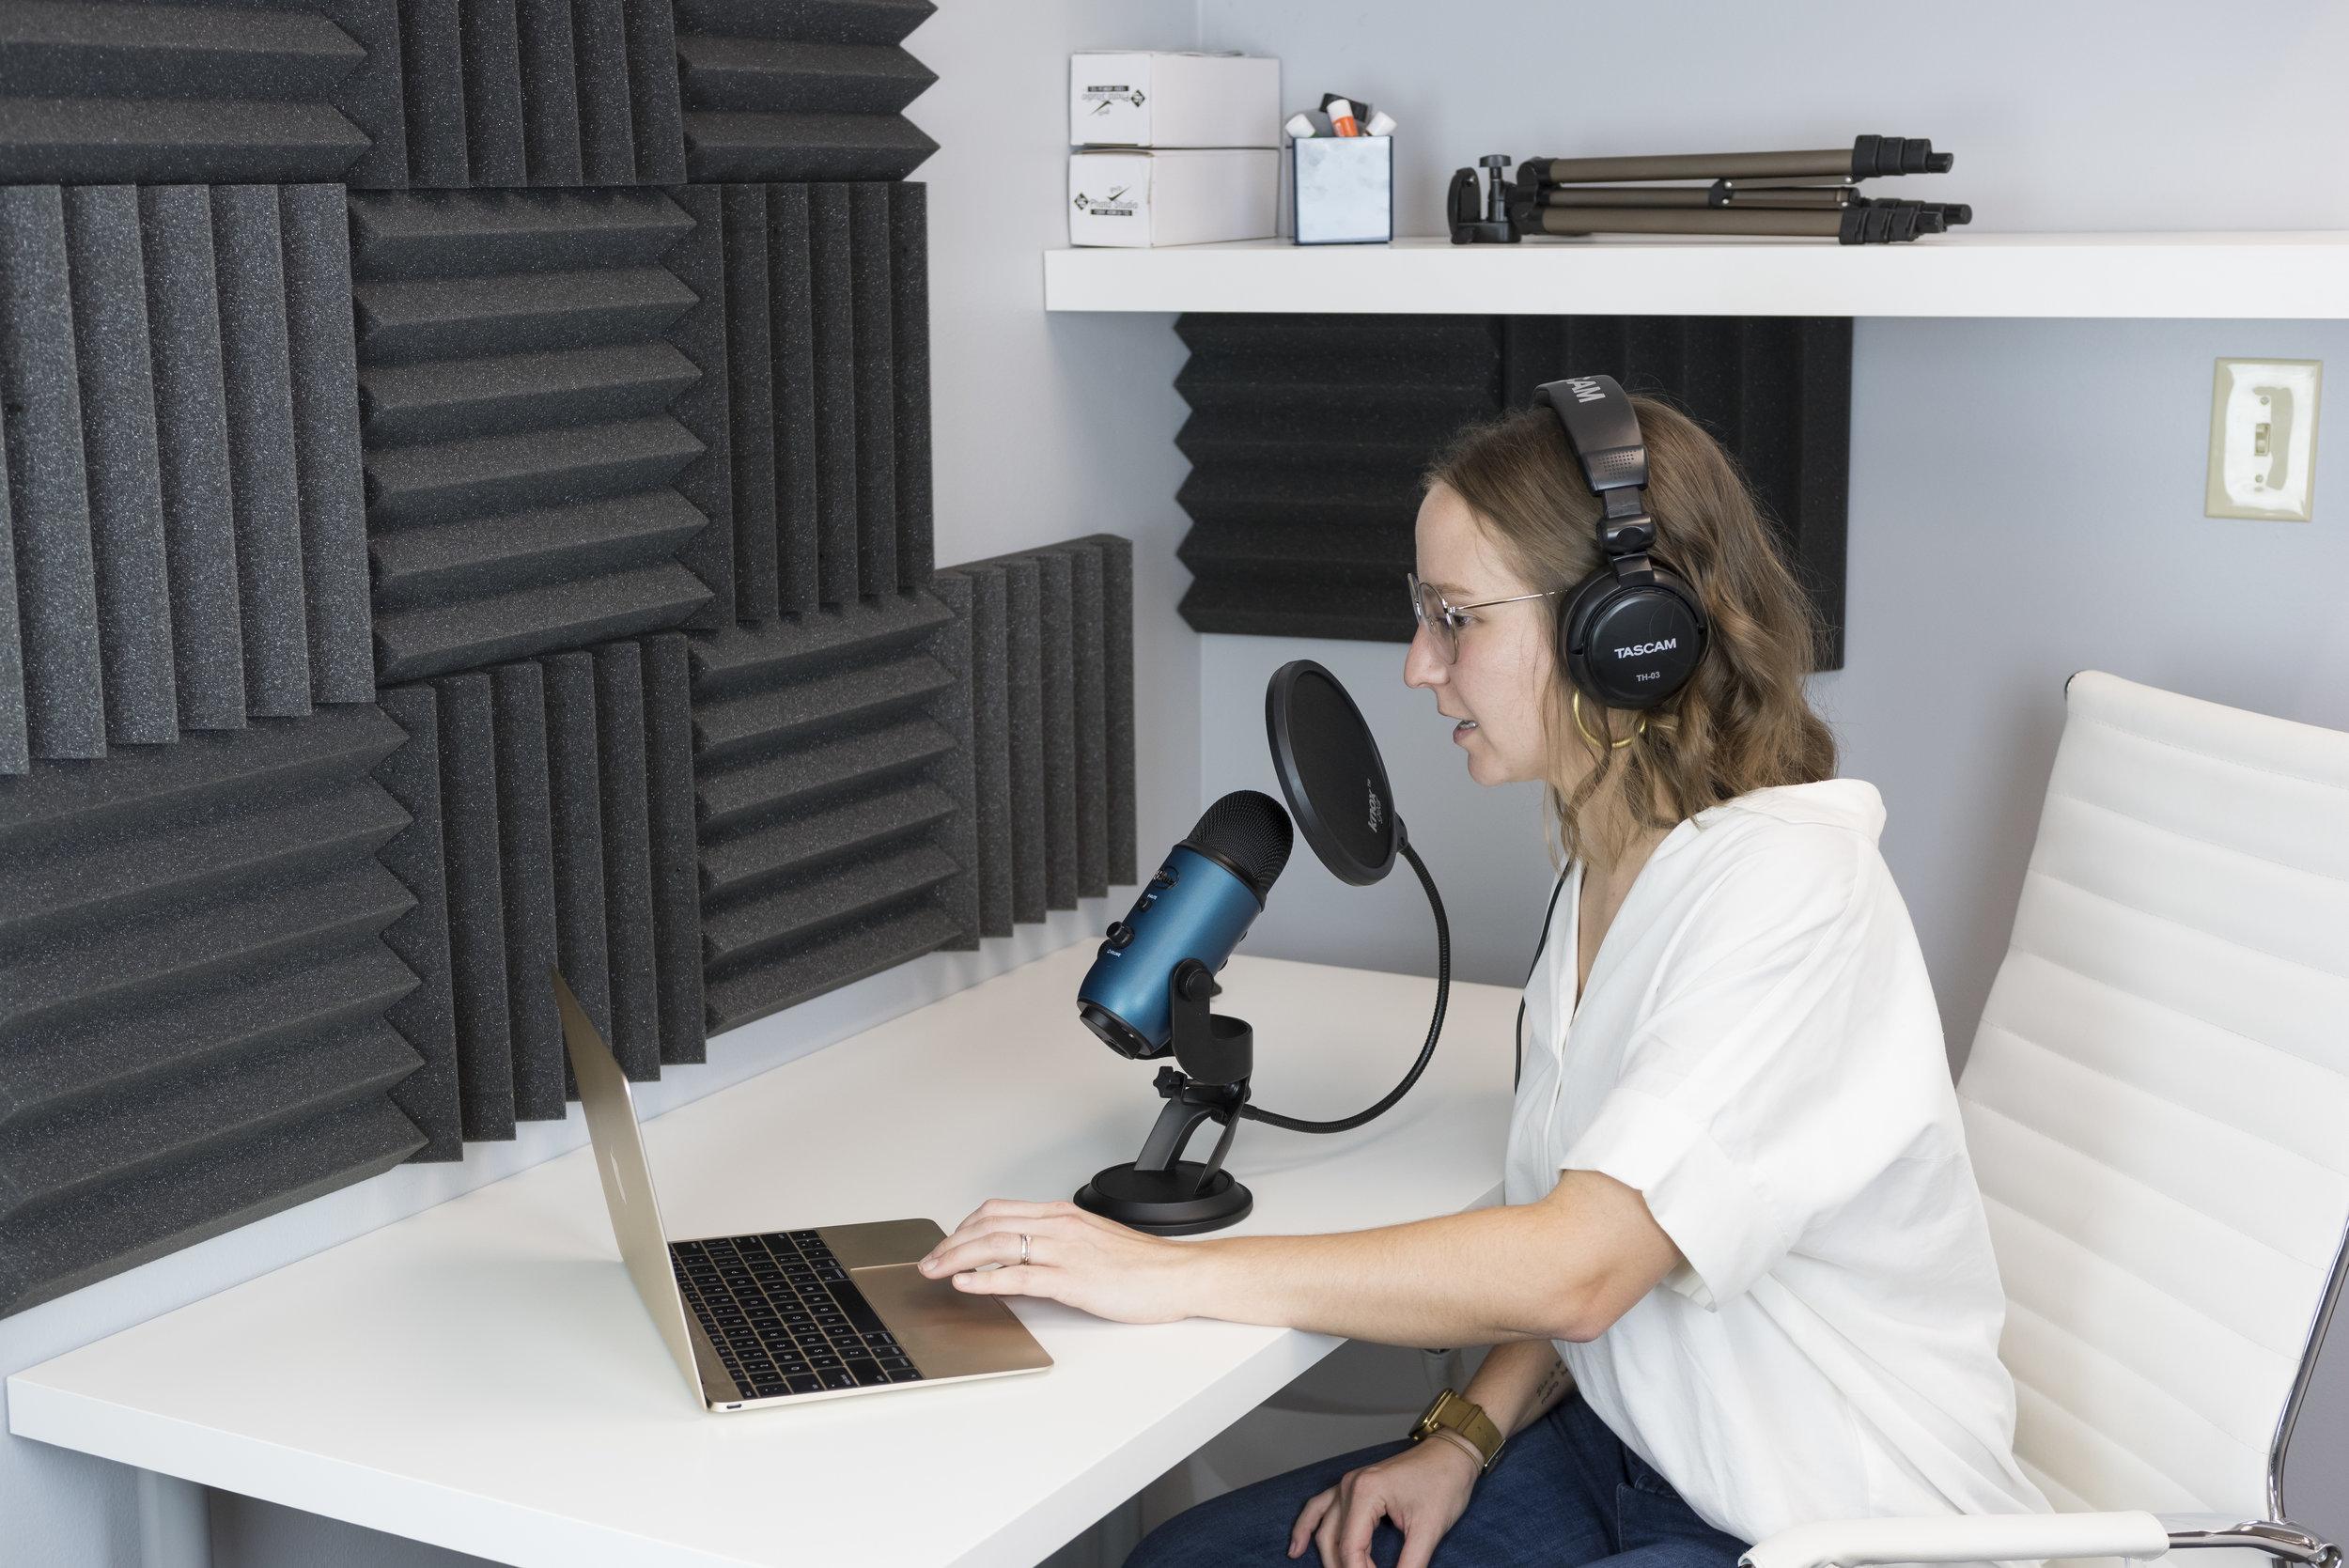 Chloe Podcasting close-up talking.jpg